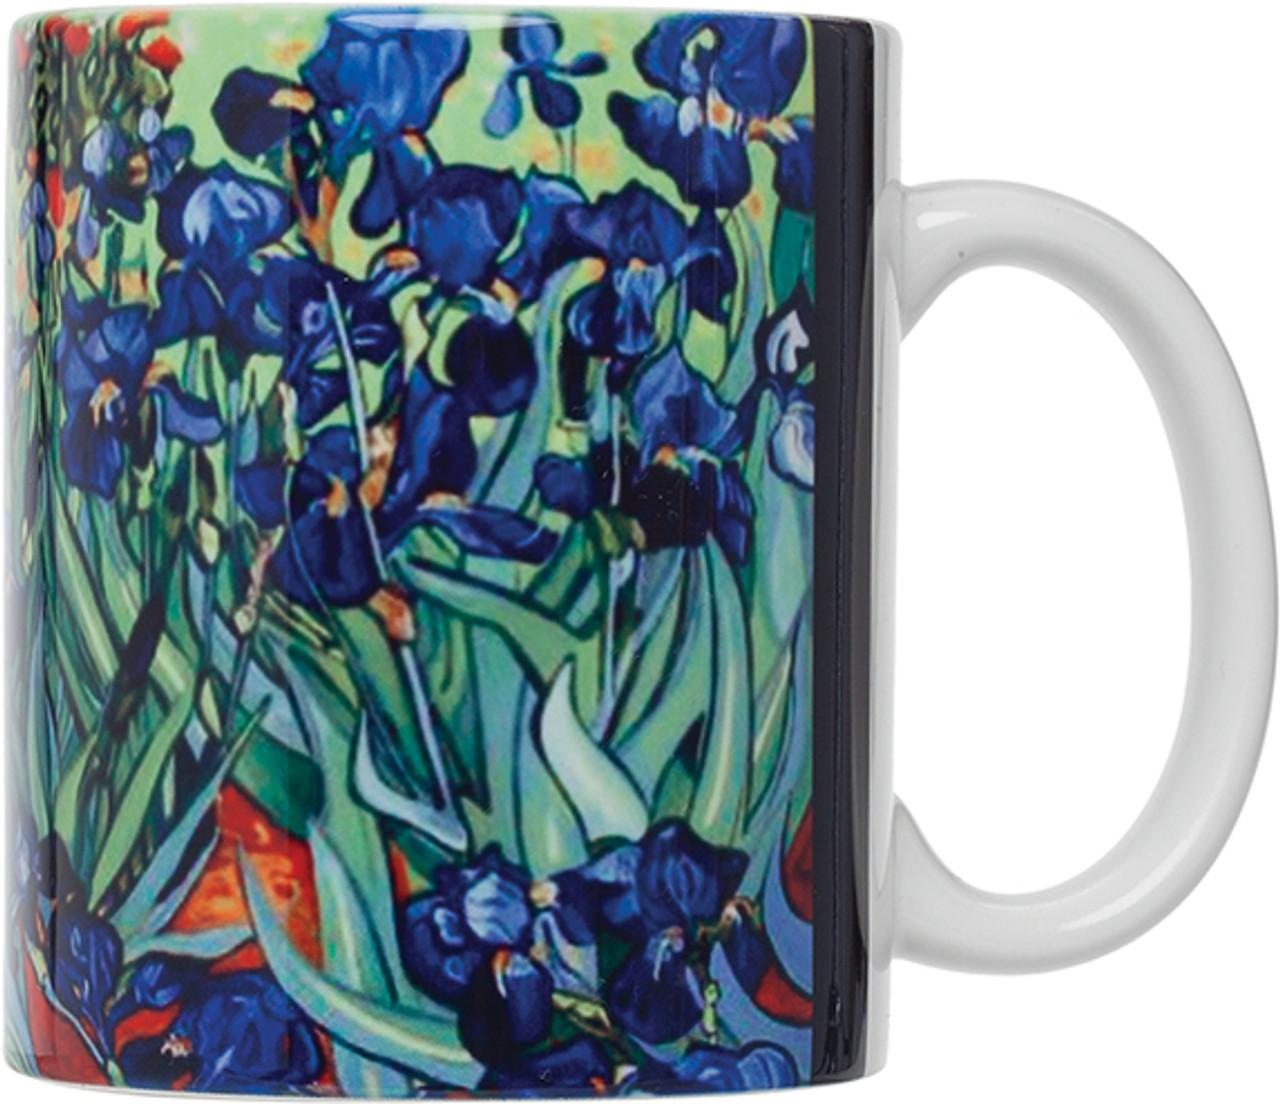 HIC Van Gogh Mug,, Les Irises, Set of 4